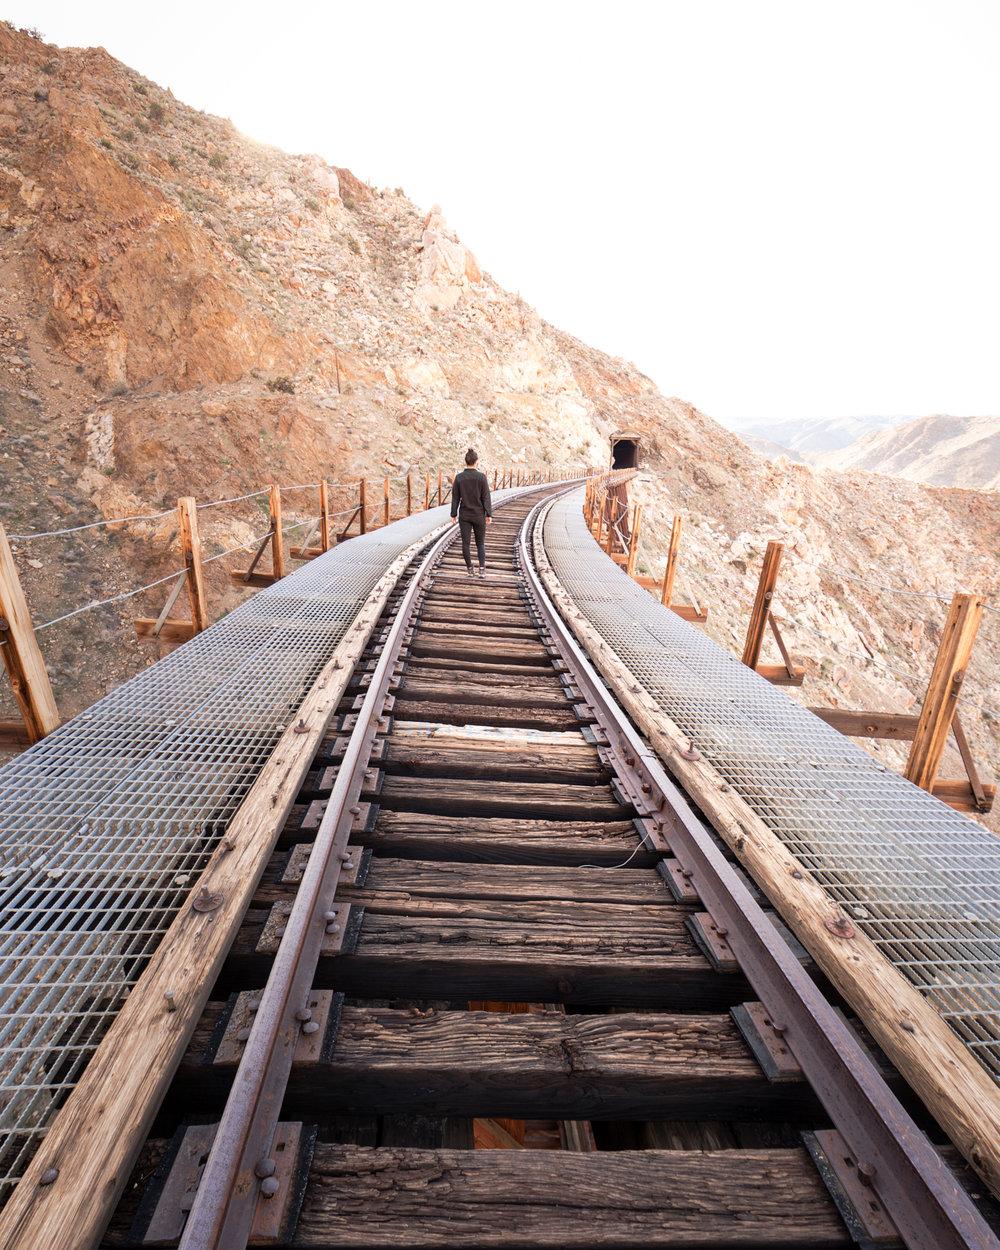 goat-canyon-trestle-bridge-california